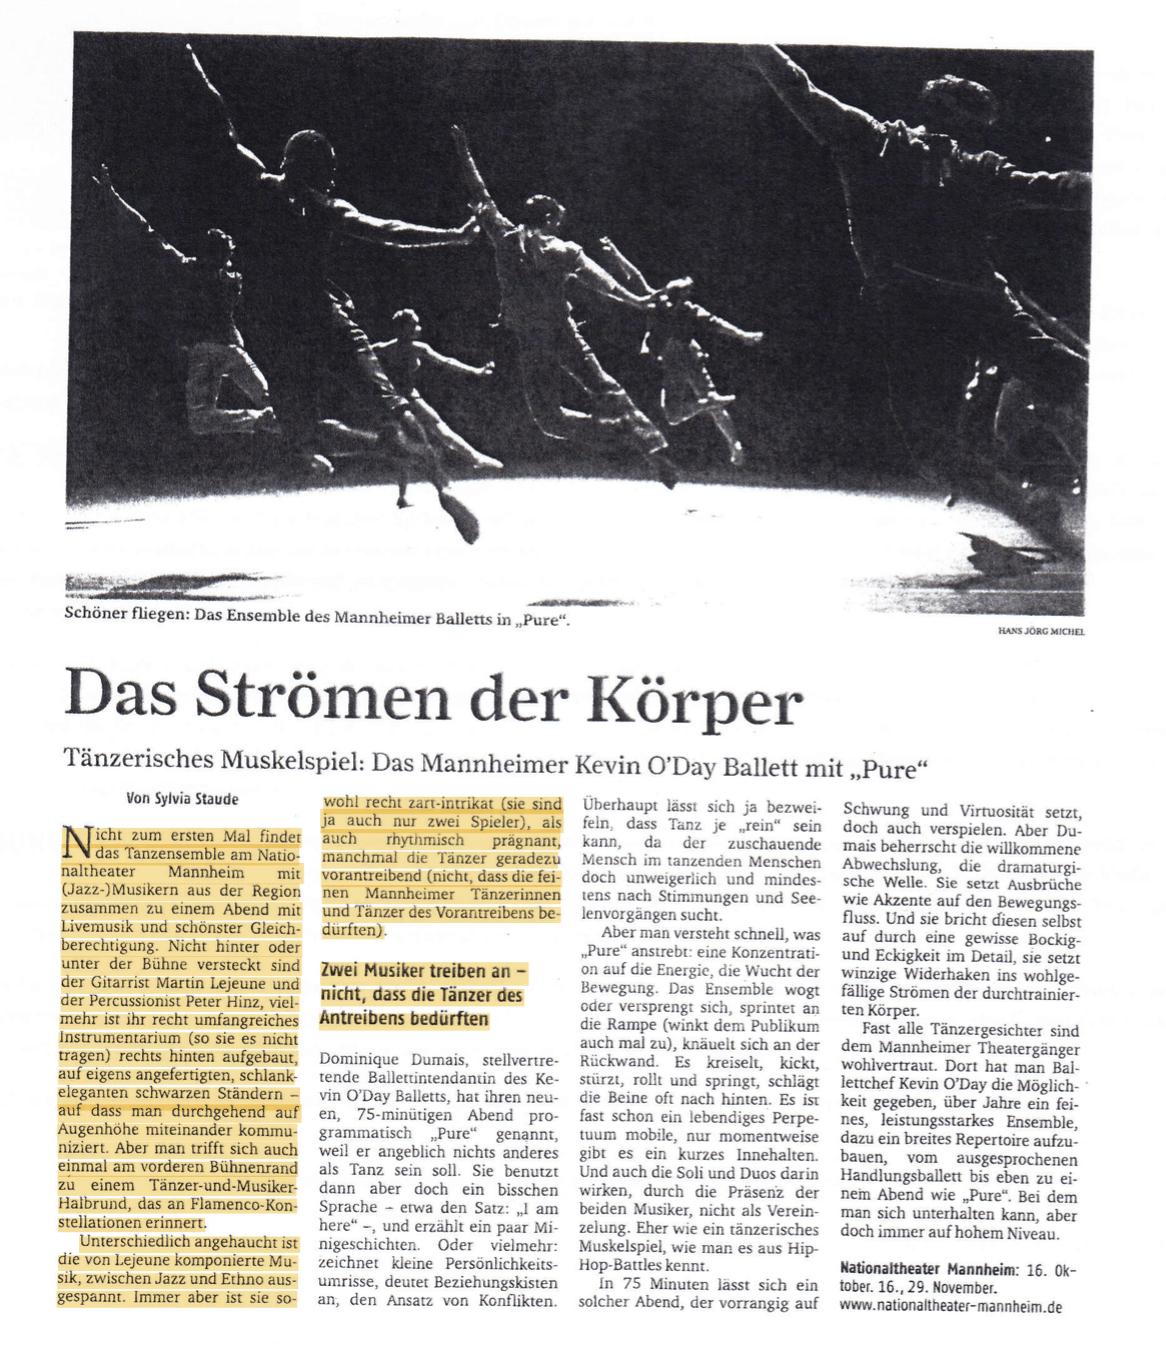 Pure, Kevin O'Day Ballett, Nationaltheater Mannheim, Bühnmusik, Komponist